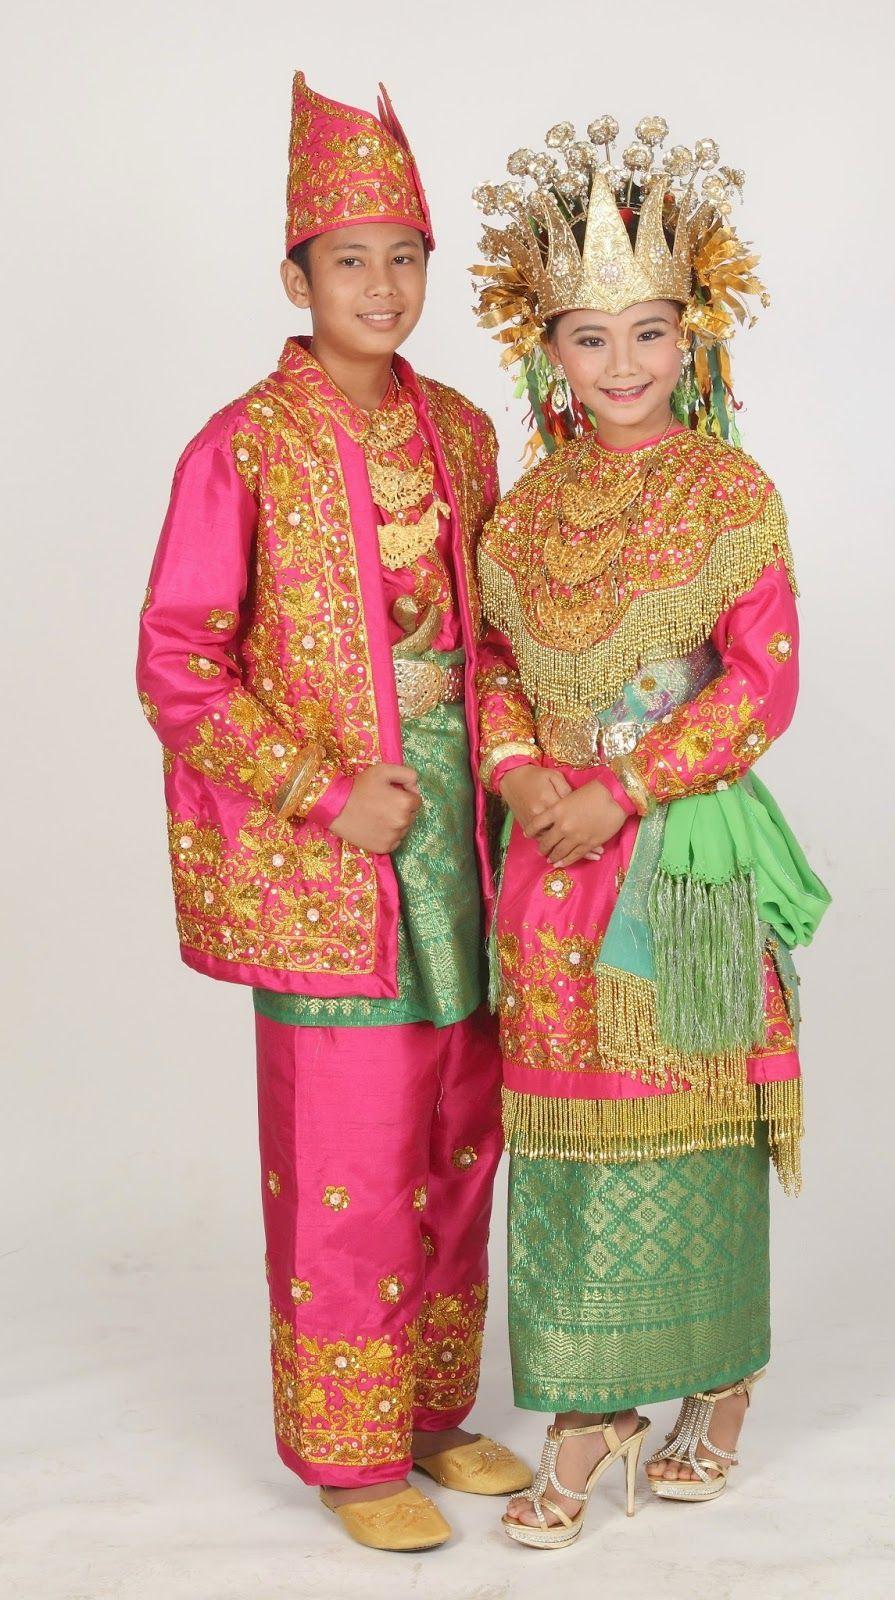 Pakaian Adat Sulawesi Tenggara Beserta Namanya